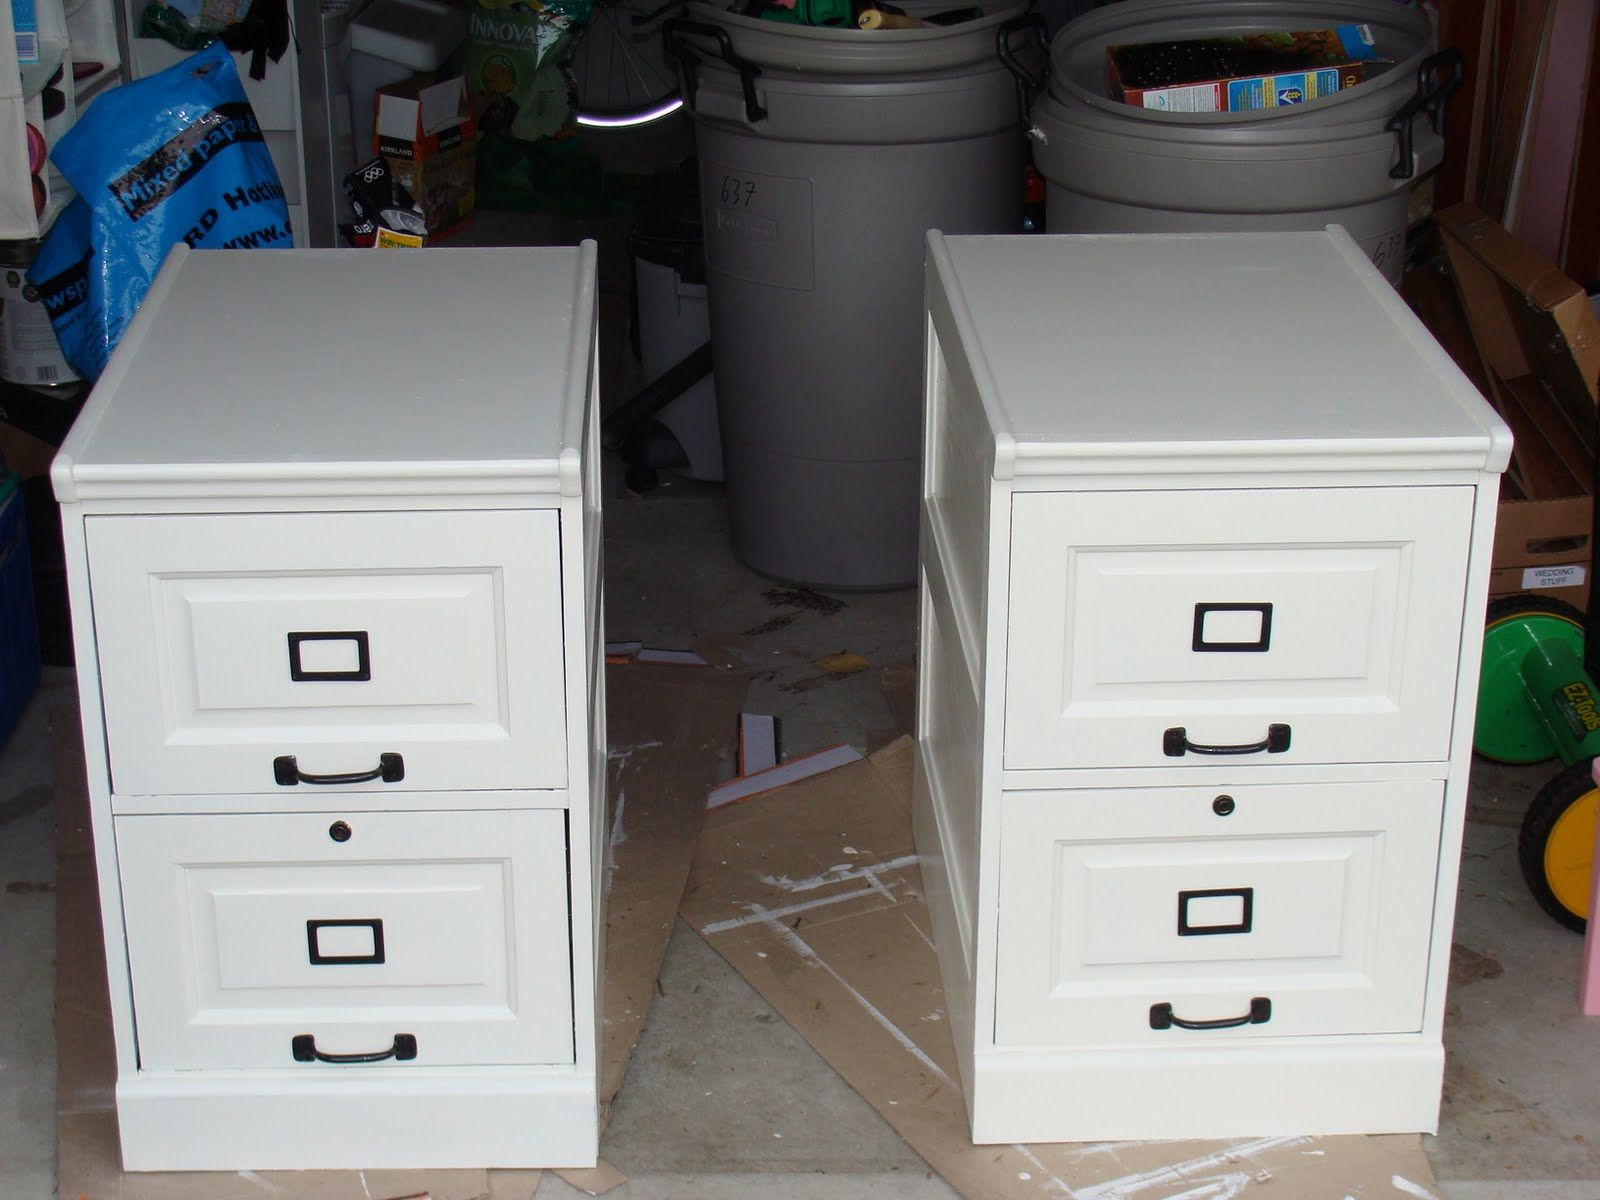 Ikea Hackers Pottery Barn Inspired Desk Transformation Ideasoffice Ideasfiling Cabinetsikea Filing Cabinetwooden